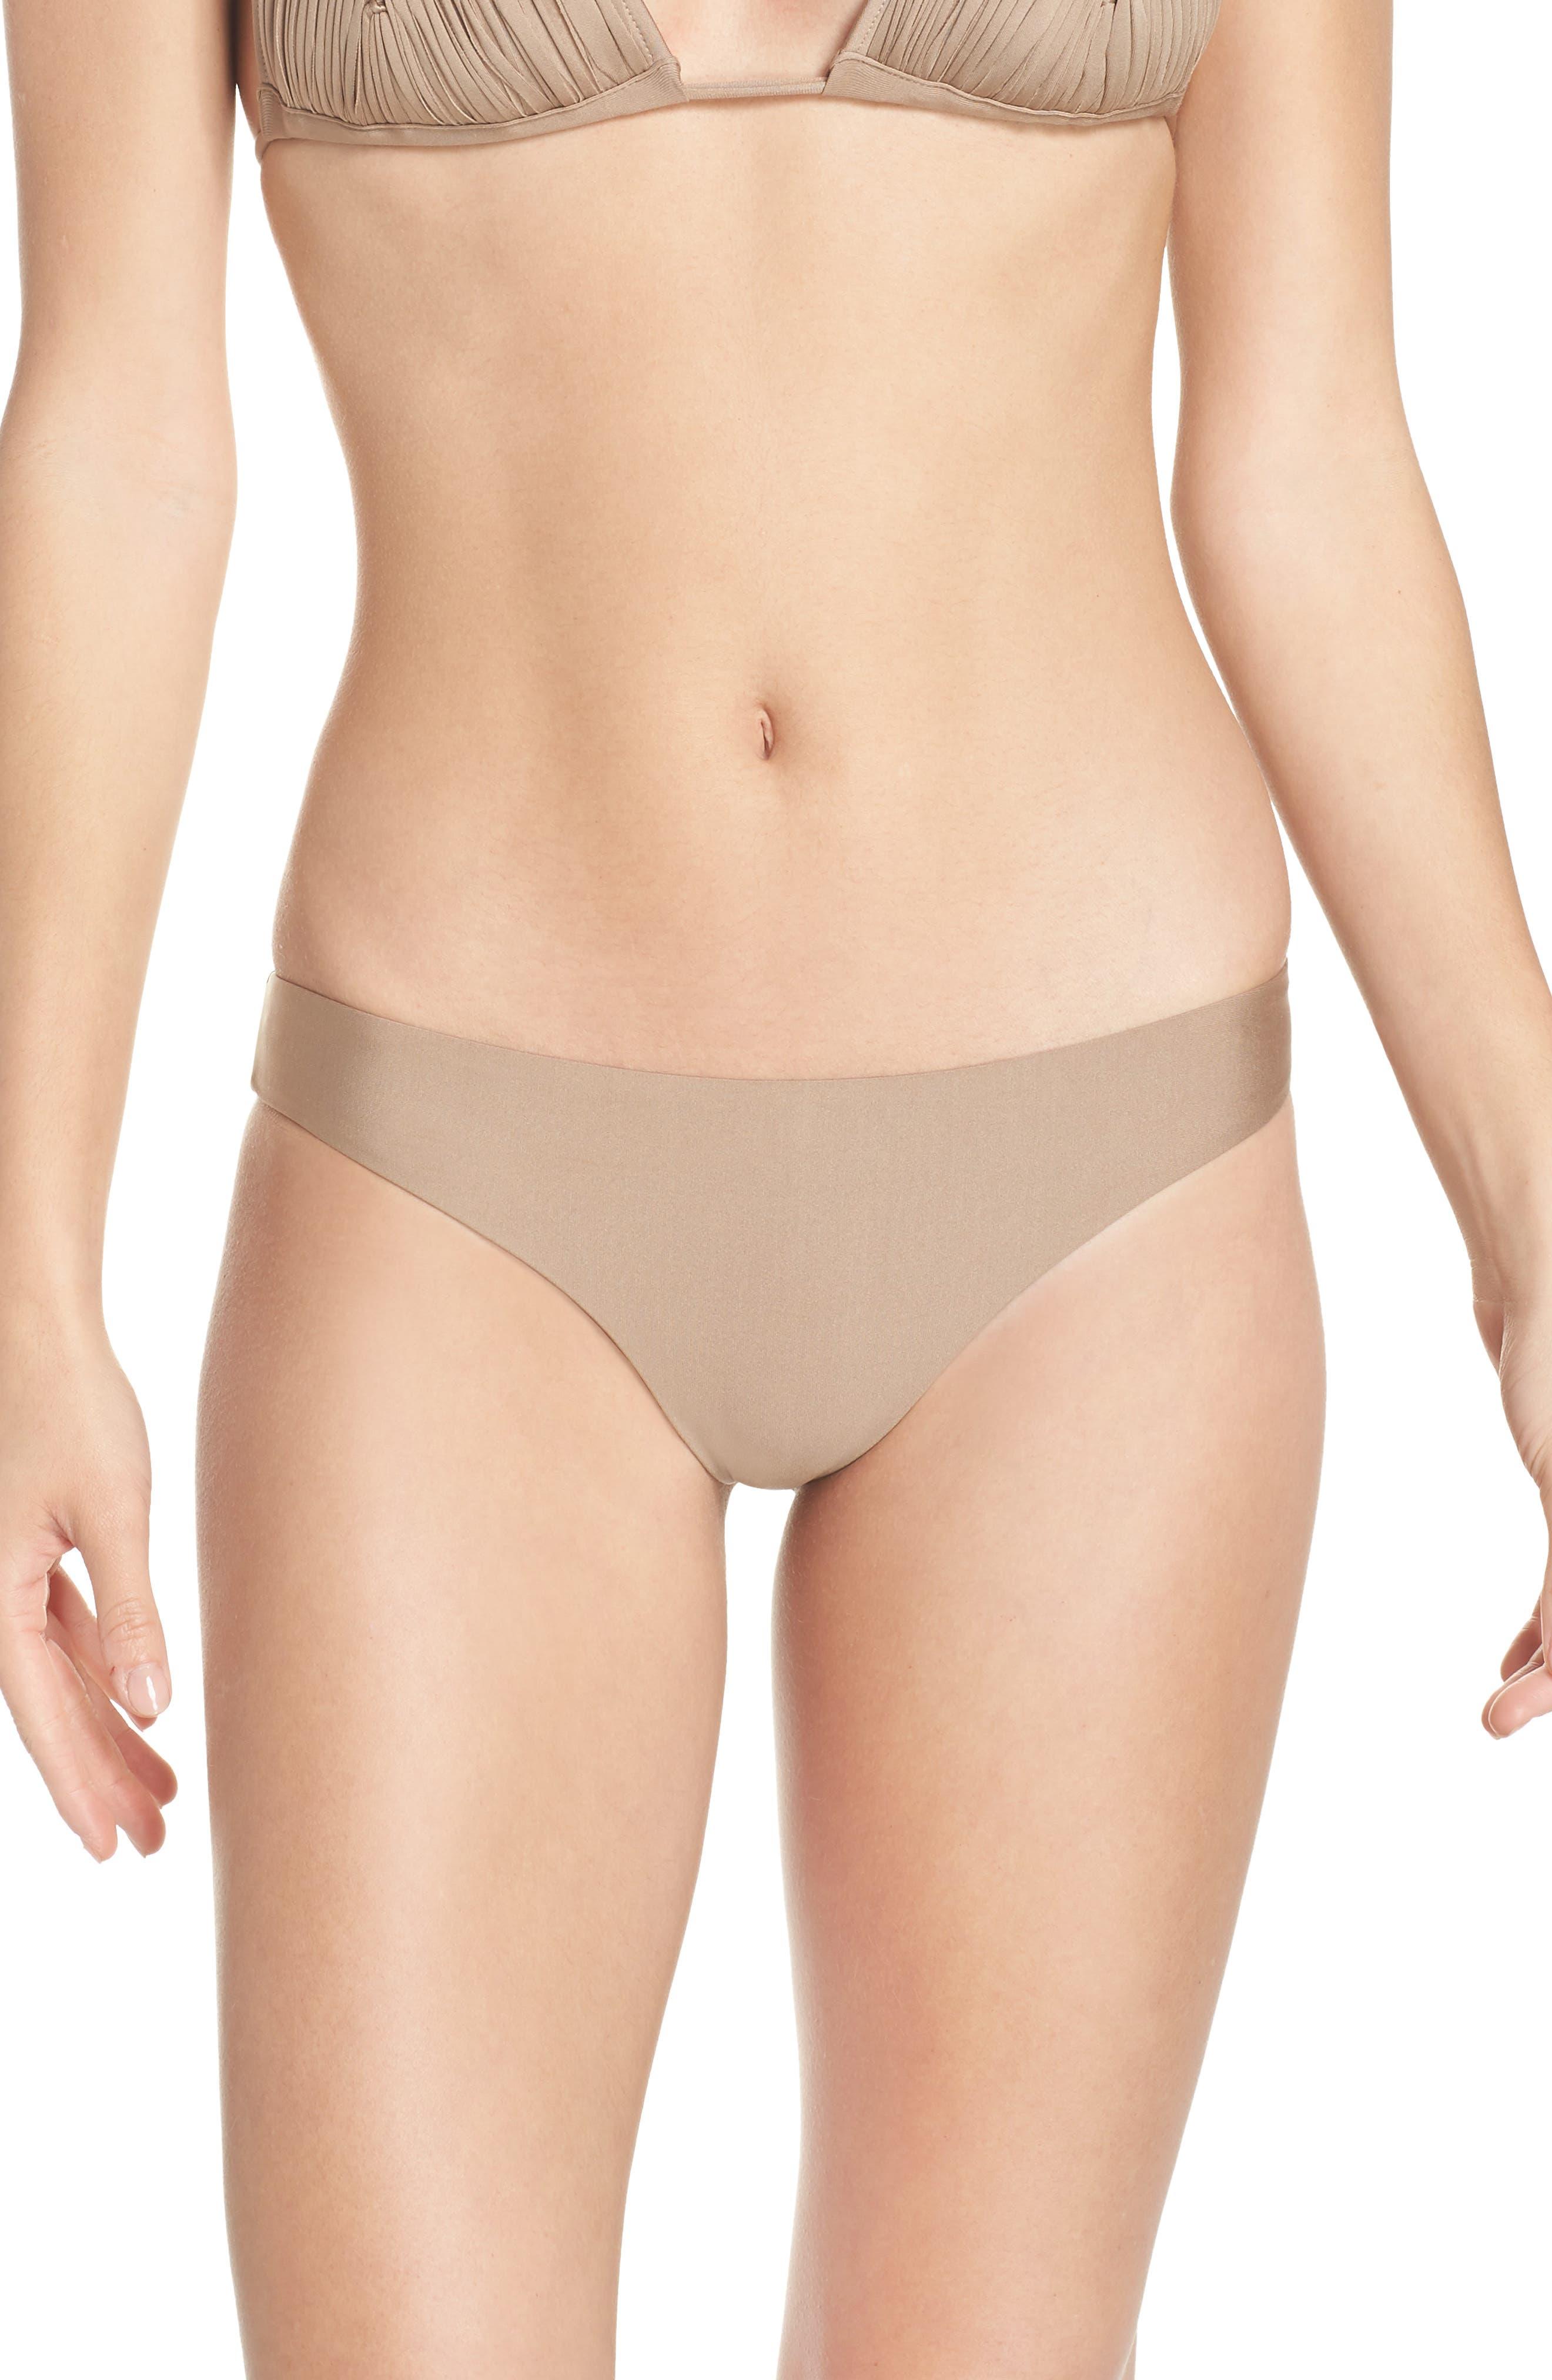 Pilyq Ruched Bikini Bottoms, Beige